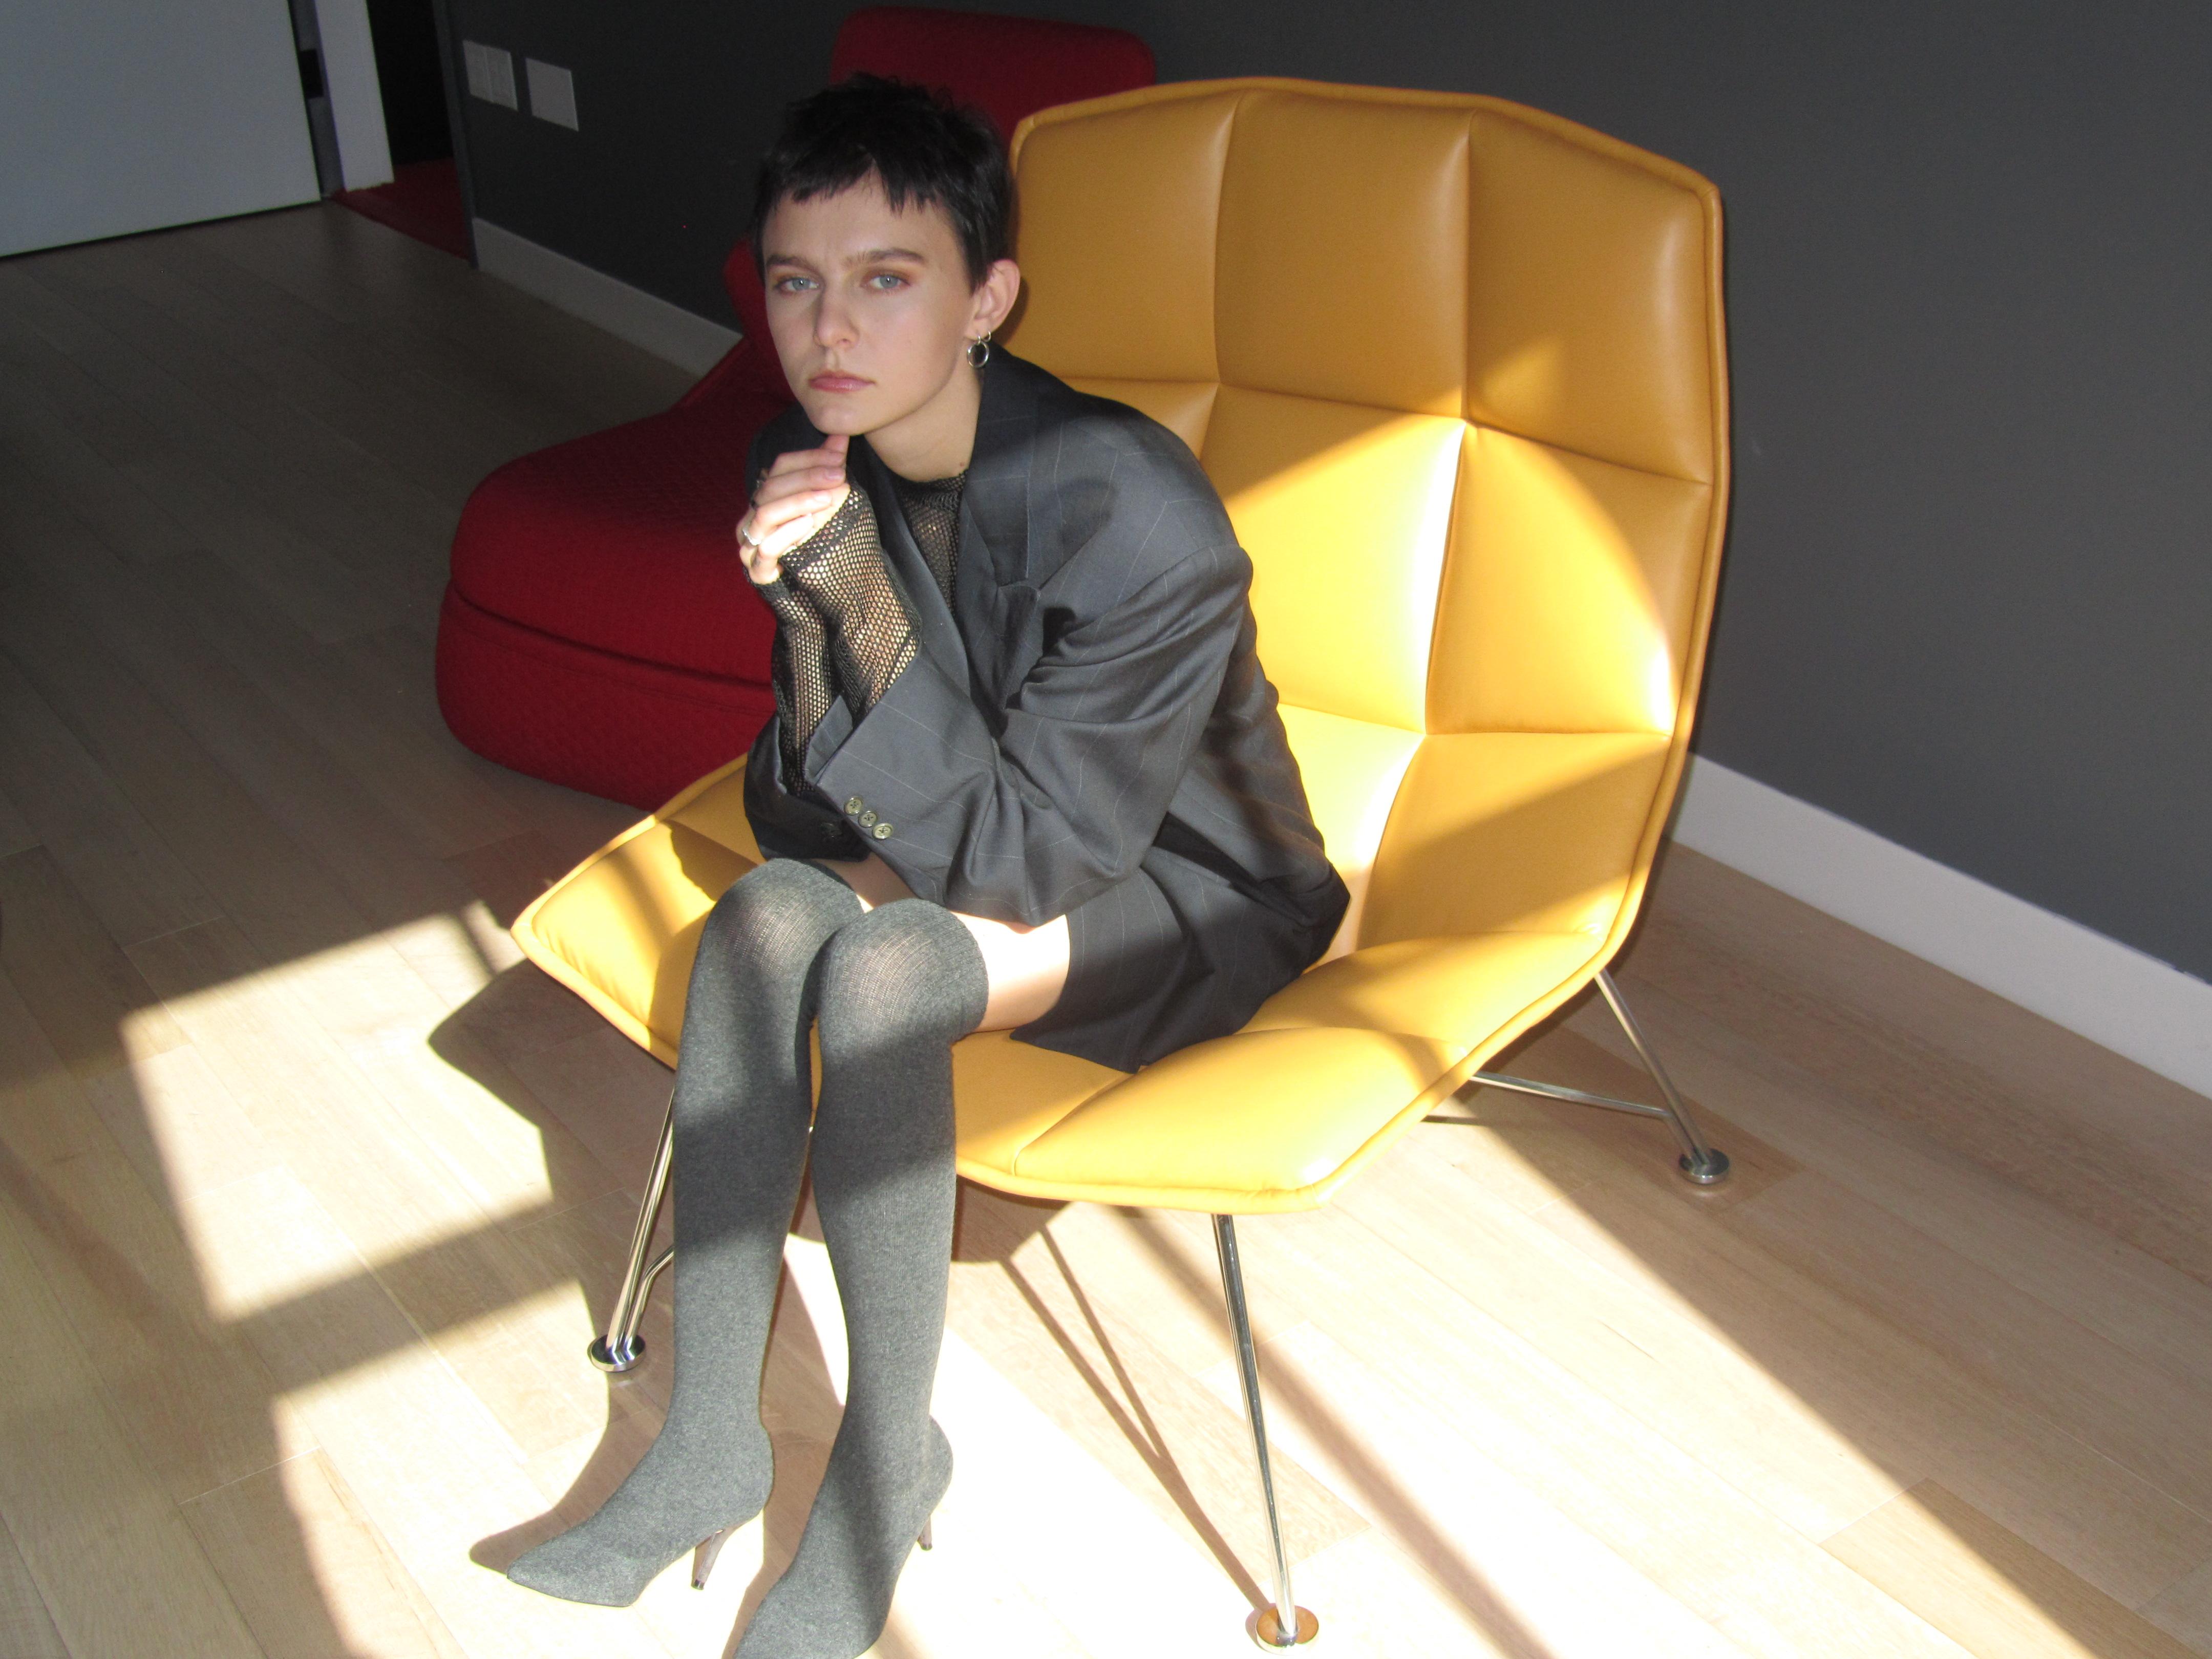 Morgan Saint, The Visual Way | elleseesnyc